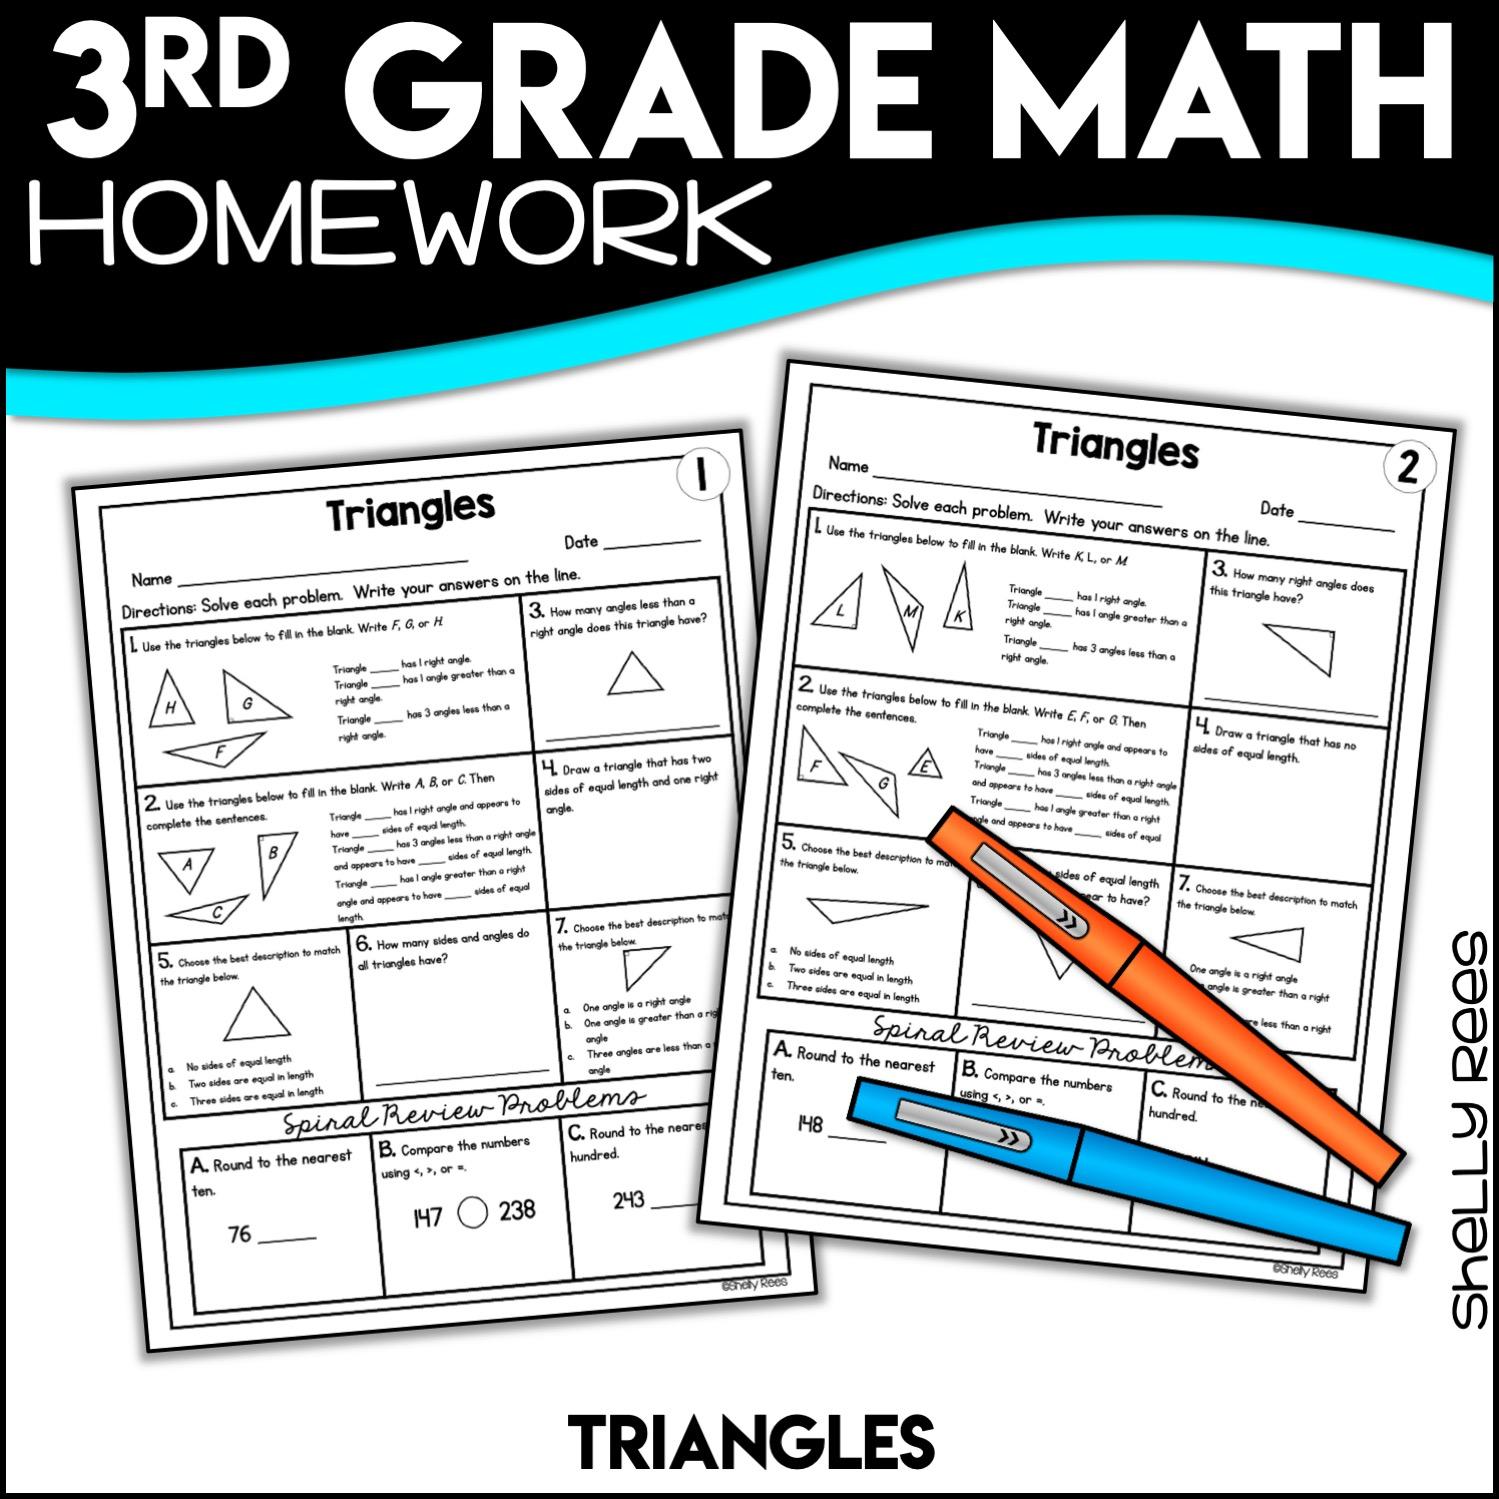 3rd Grade Math Worksheets Free And Printable